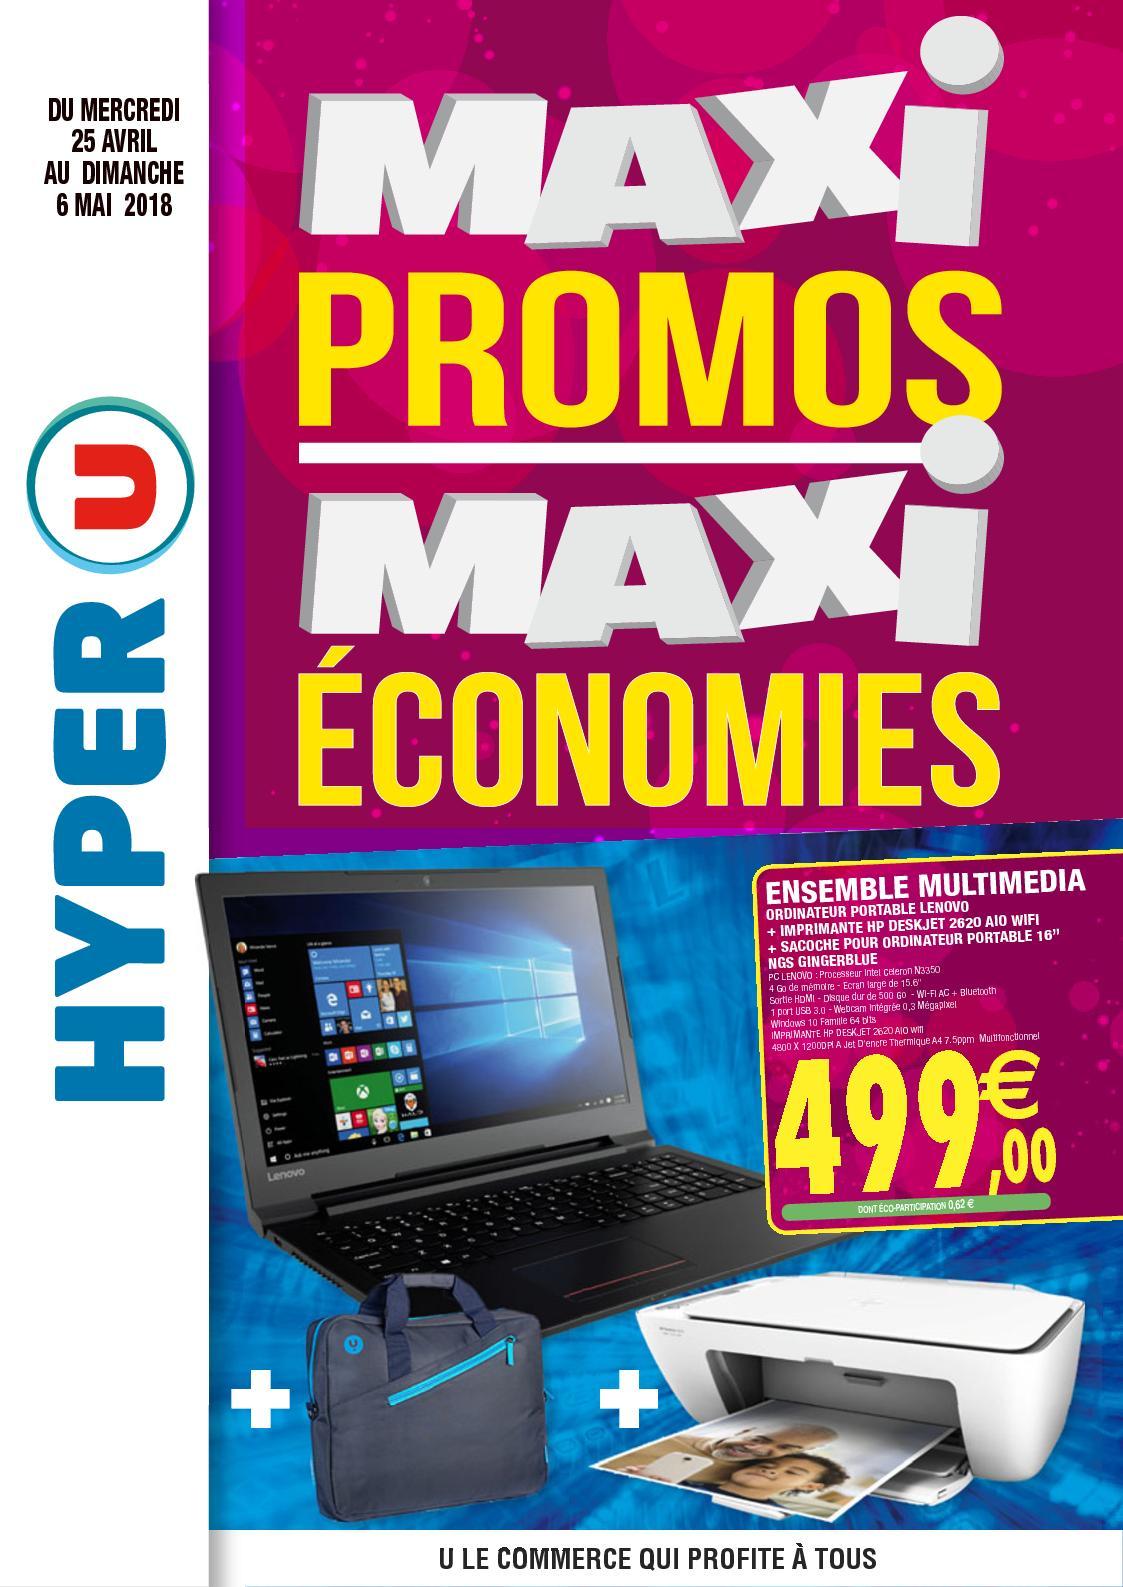 6e36a13af5 Calaméo - Catalogue HYPER U Maxi Promo Maxi Economies du 25/04 au 06/05